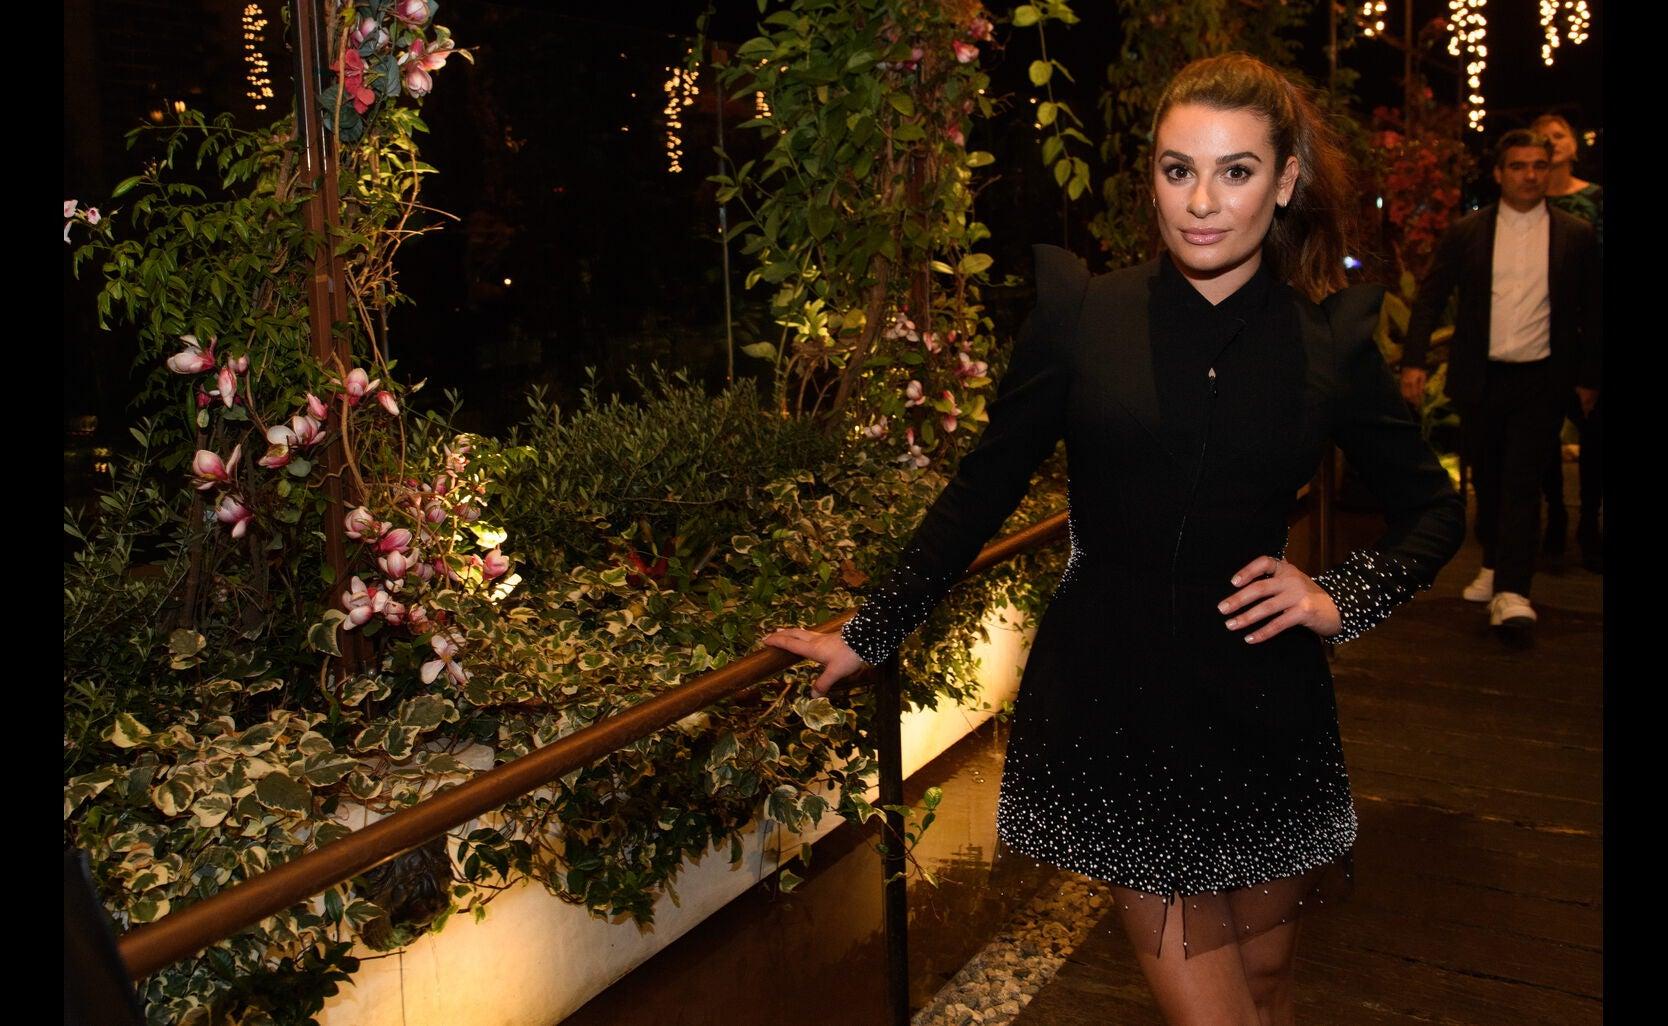 Lea Michele at the Golden Globe Ambassador 2018 event